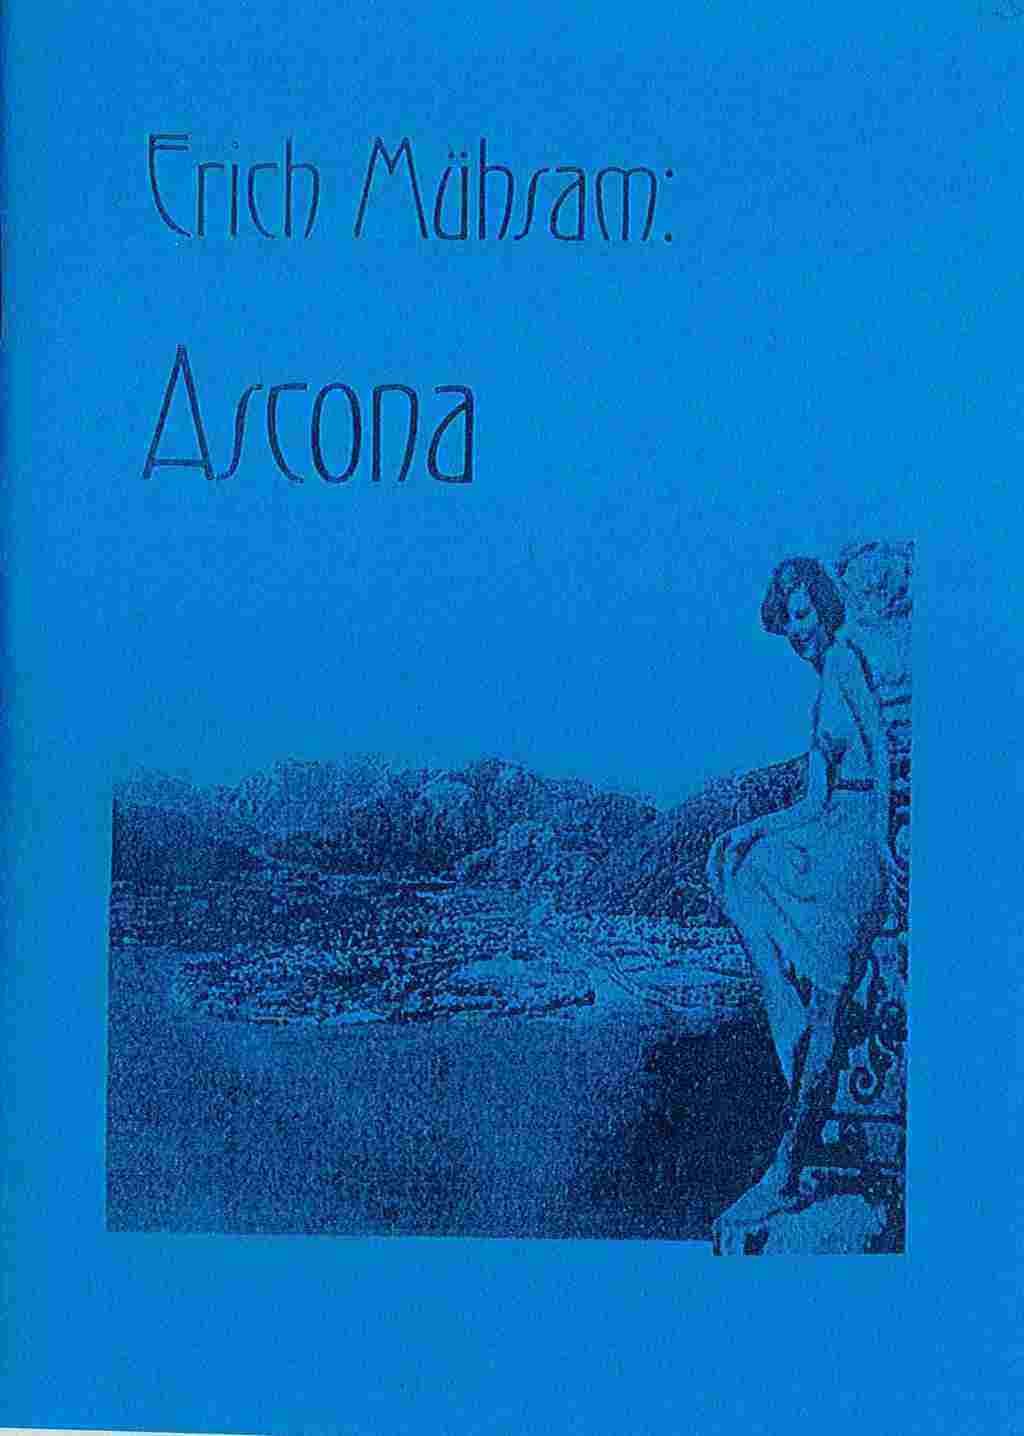 Mühsam Ascona